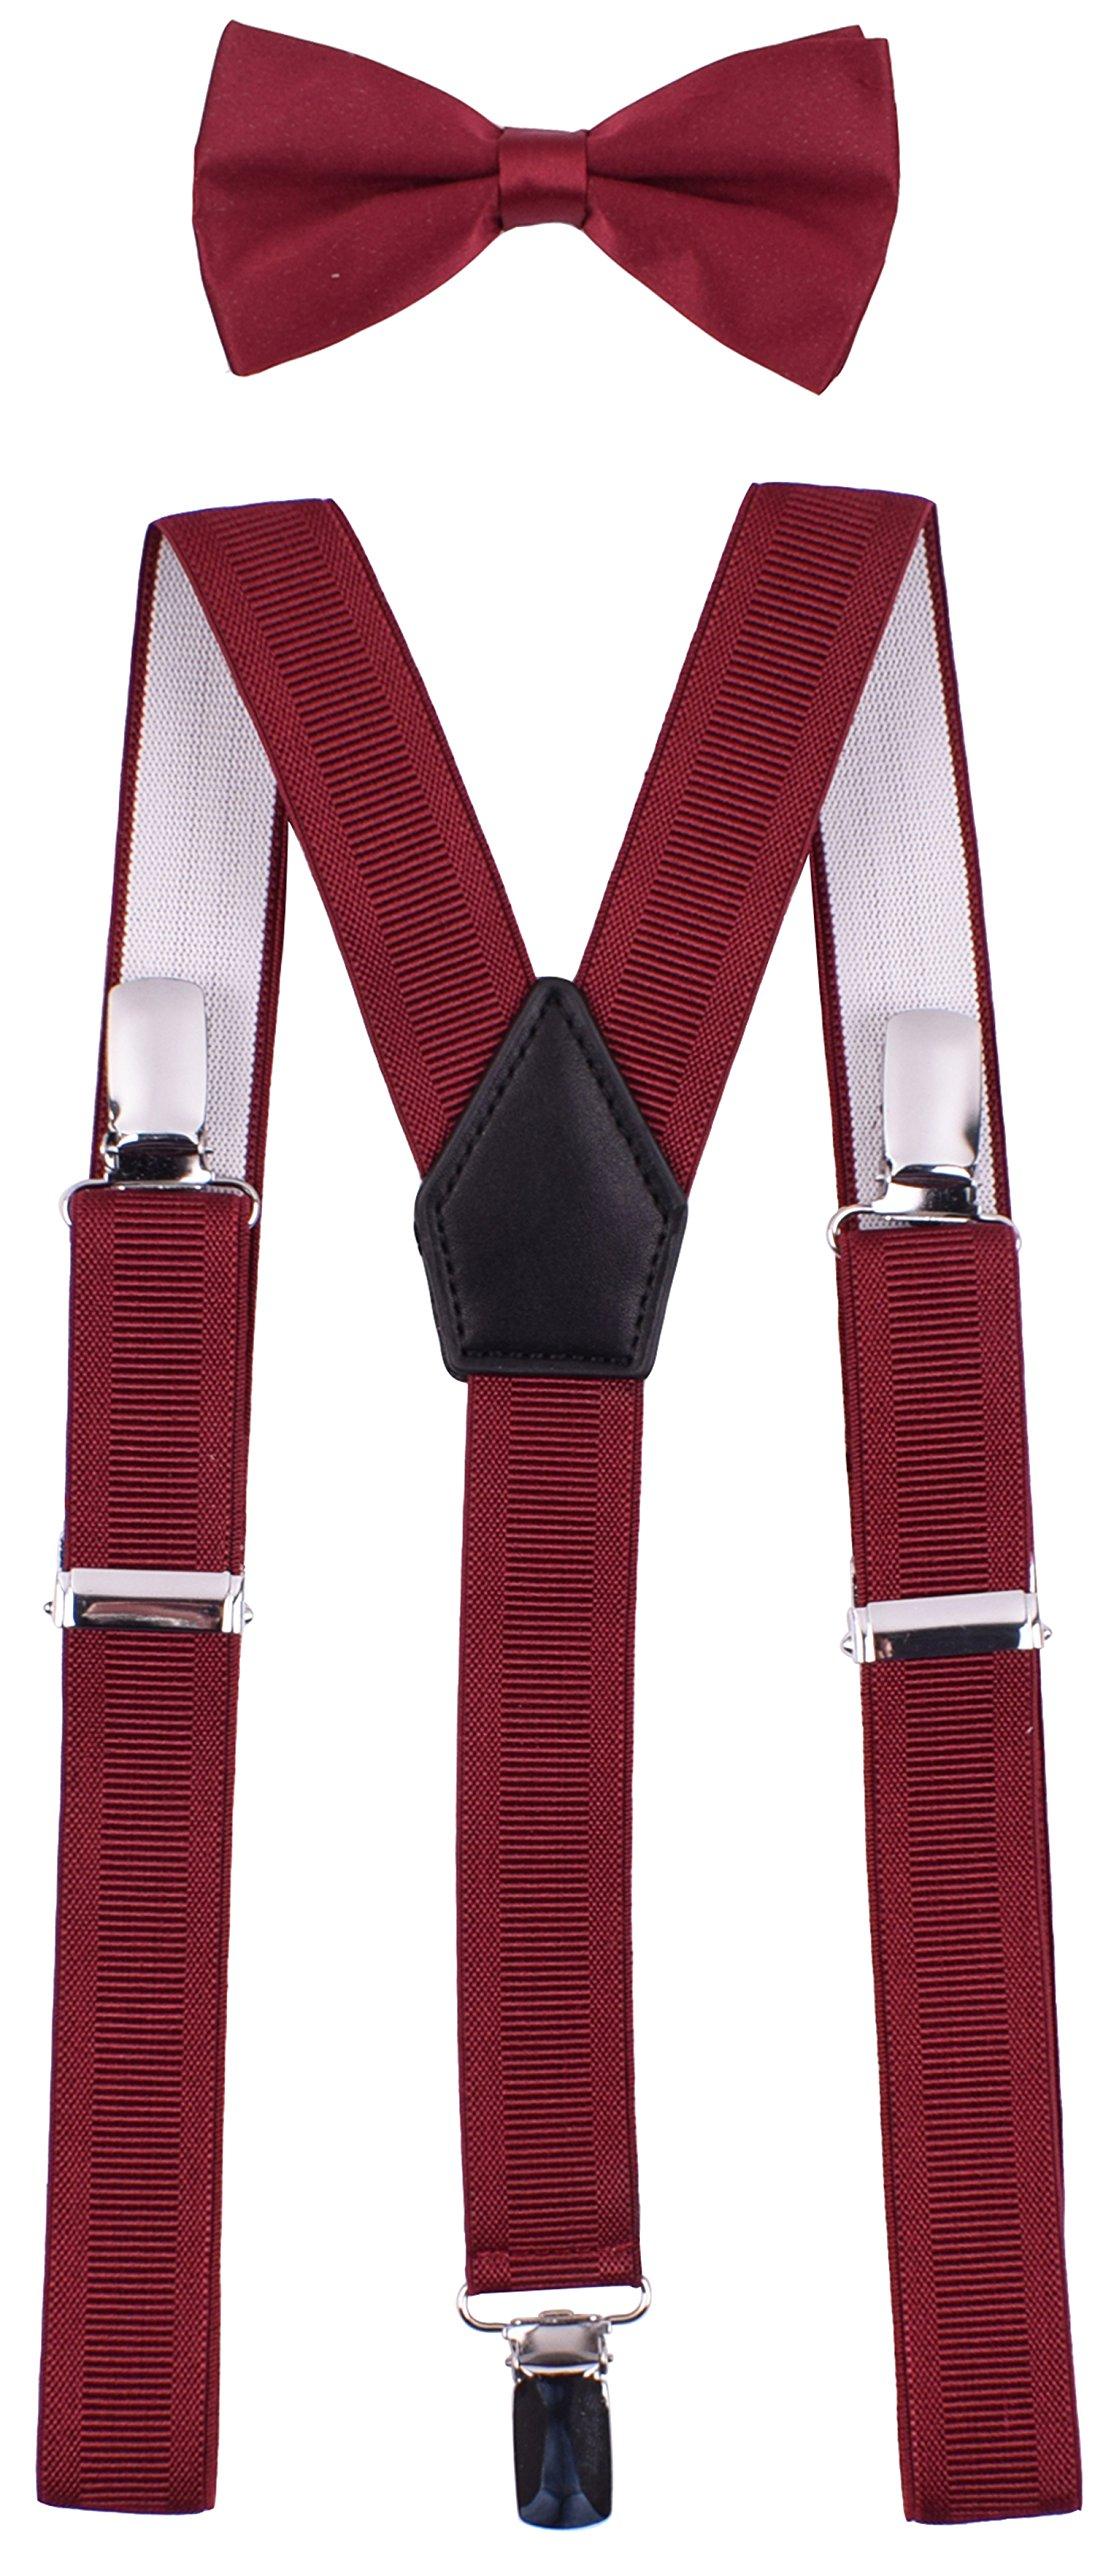 YJDS Kids Suspender Bowtie Sets Classic Y Back Burgundy Thread 22''